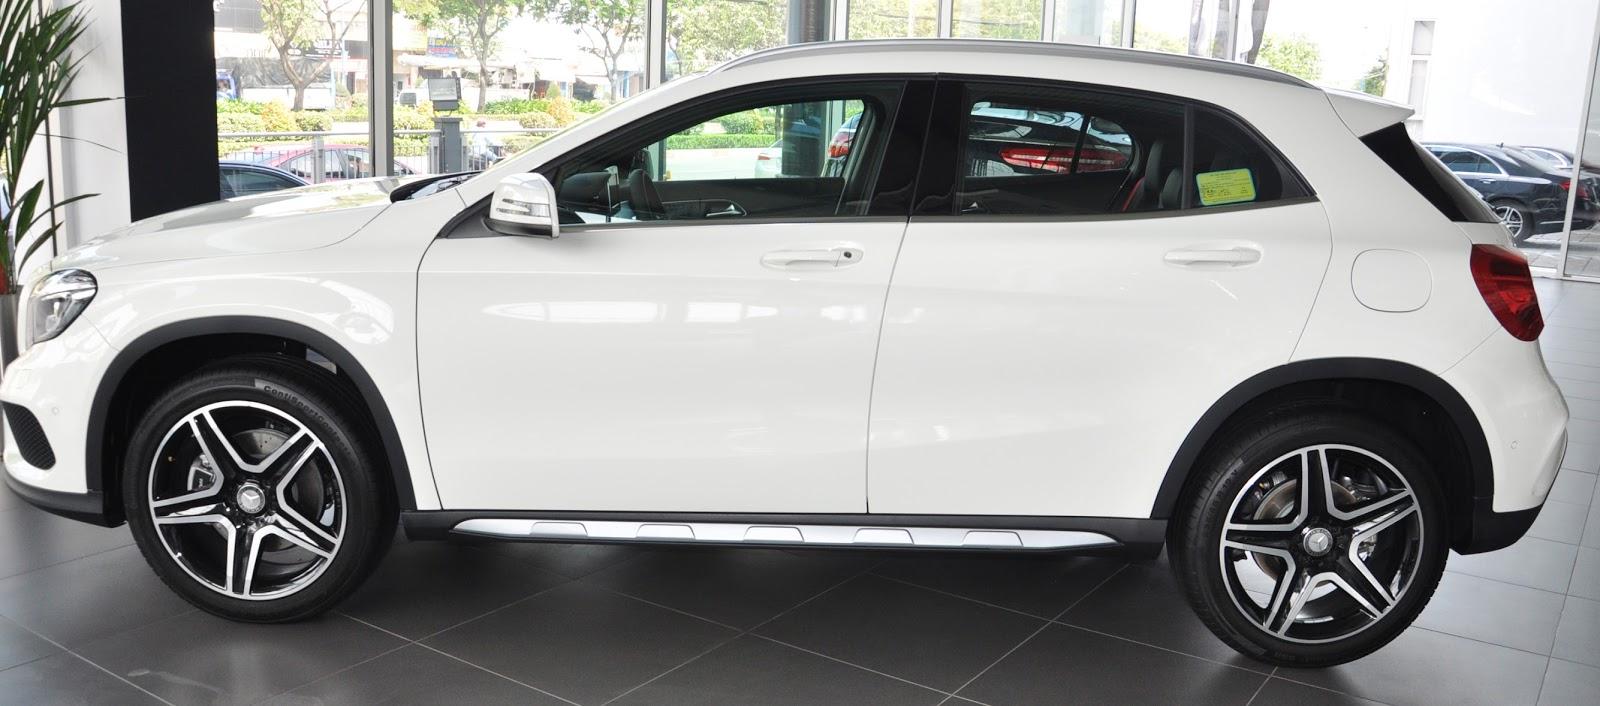 Xe Mercedes Benz GLA 250 4Matic màu trắng 03